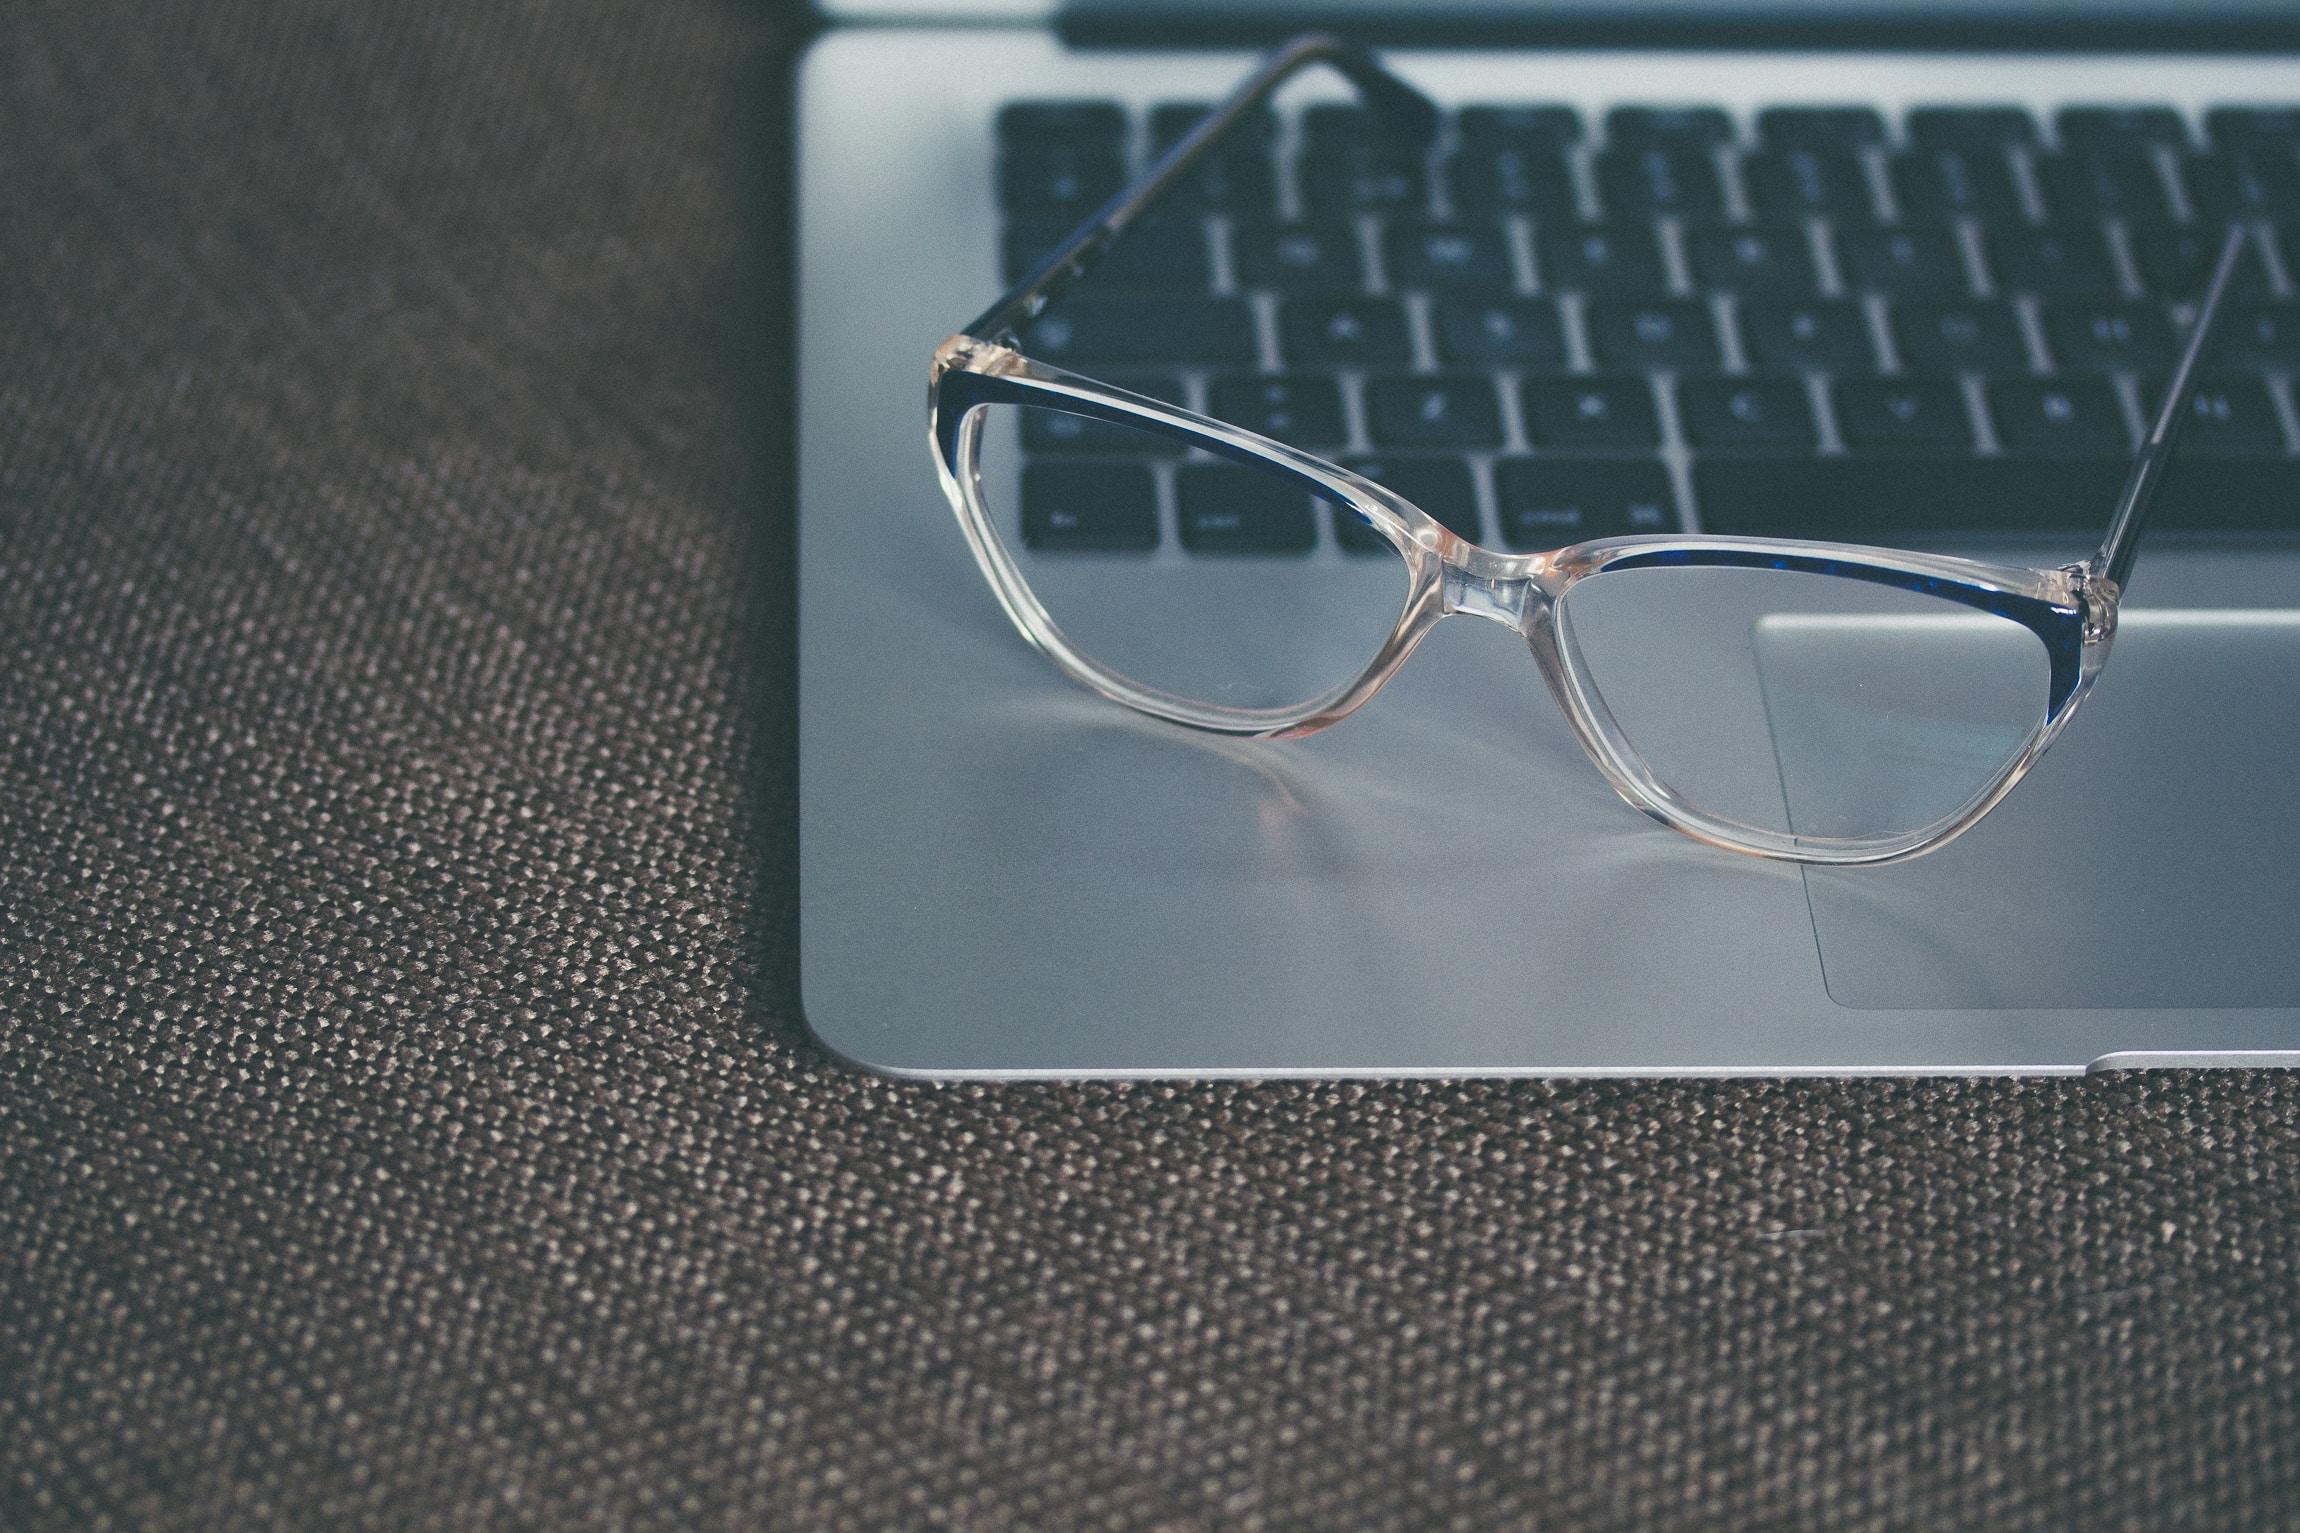 clear eyeglasses with black frames on laptop